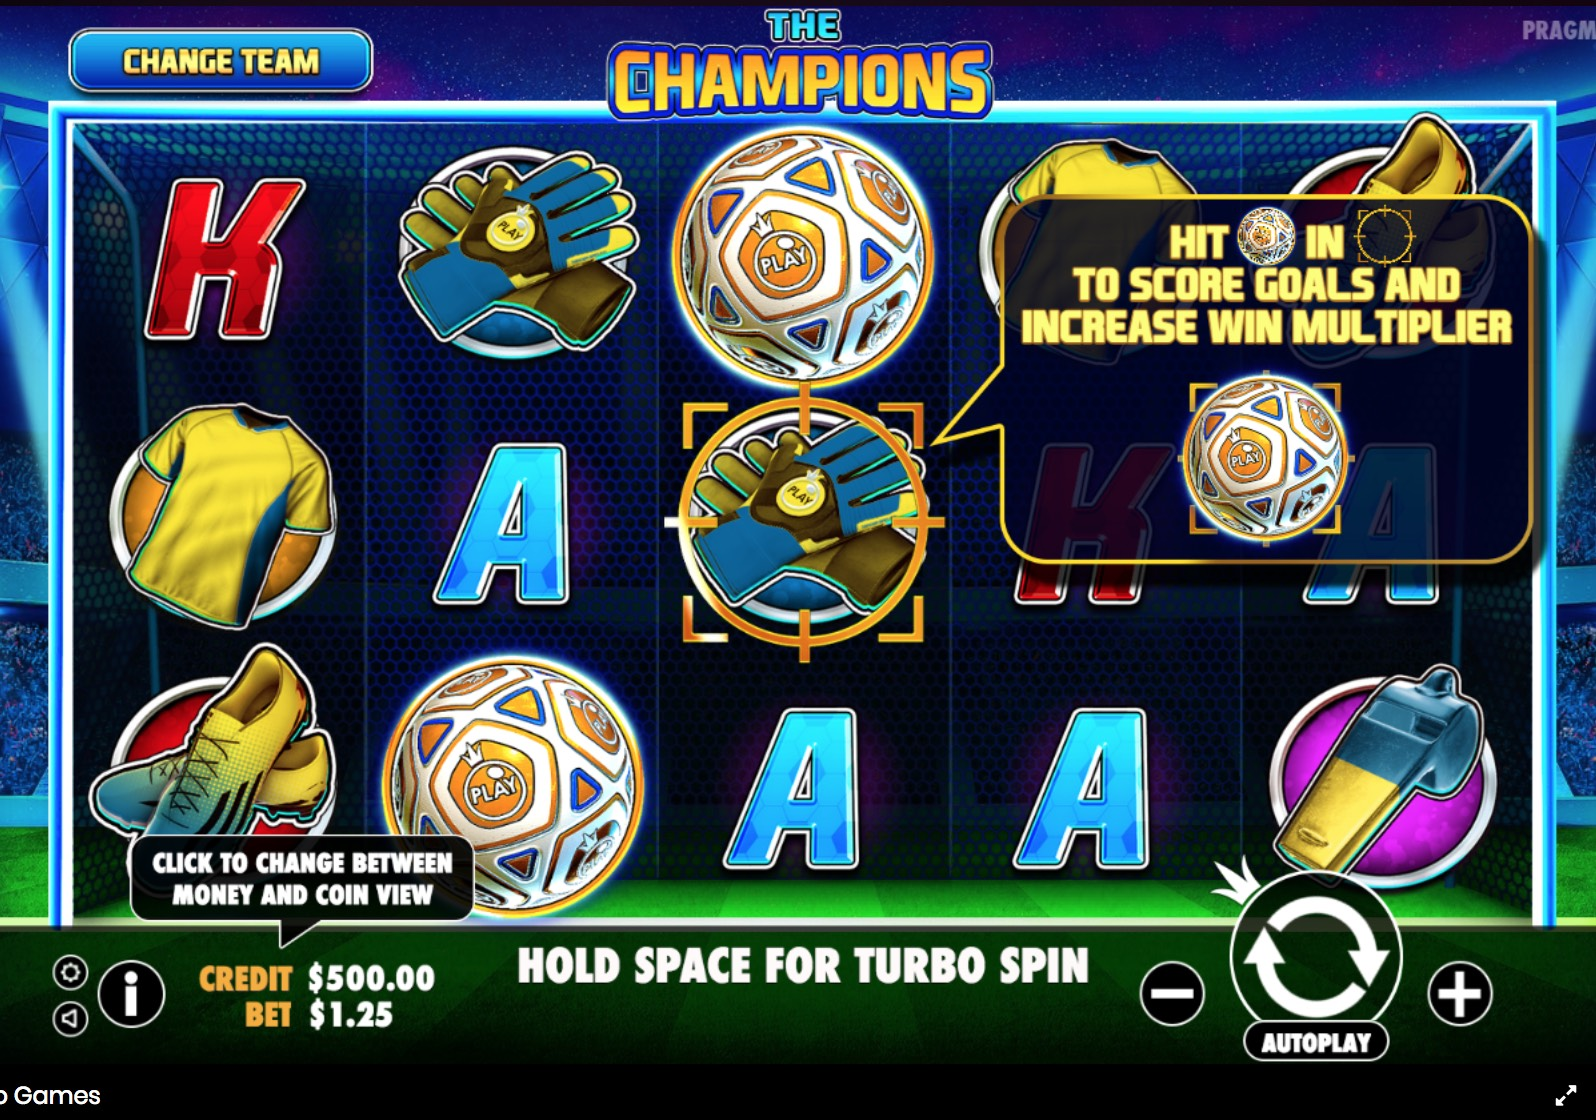 free games slot machines casinos